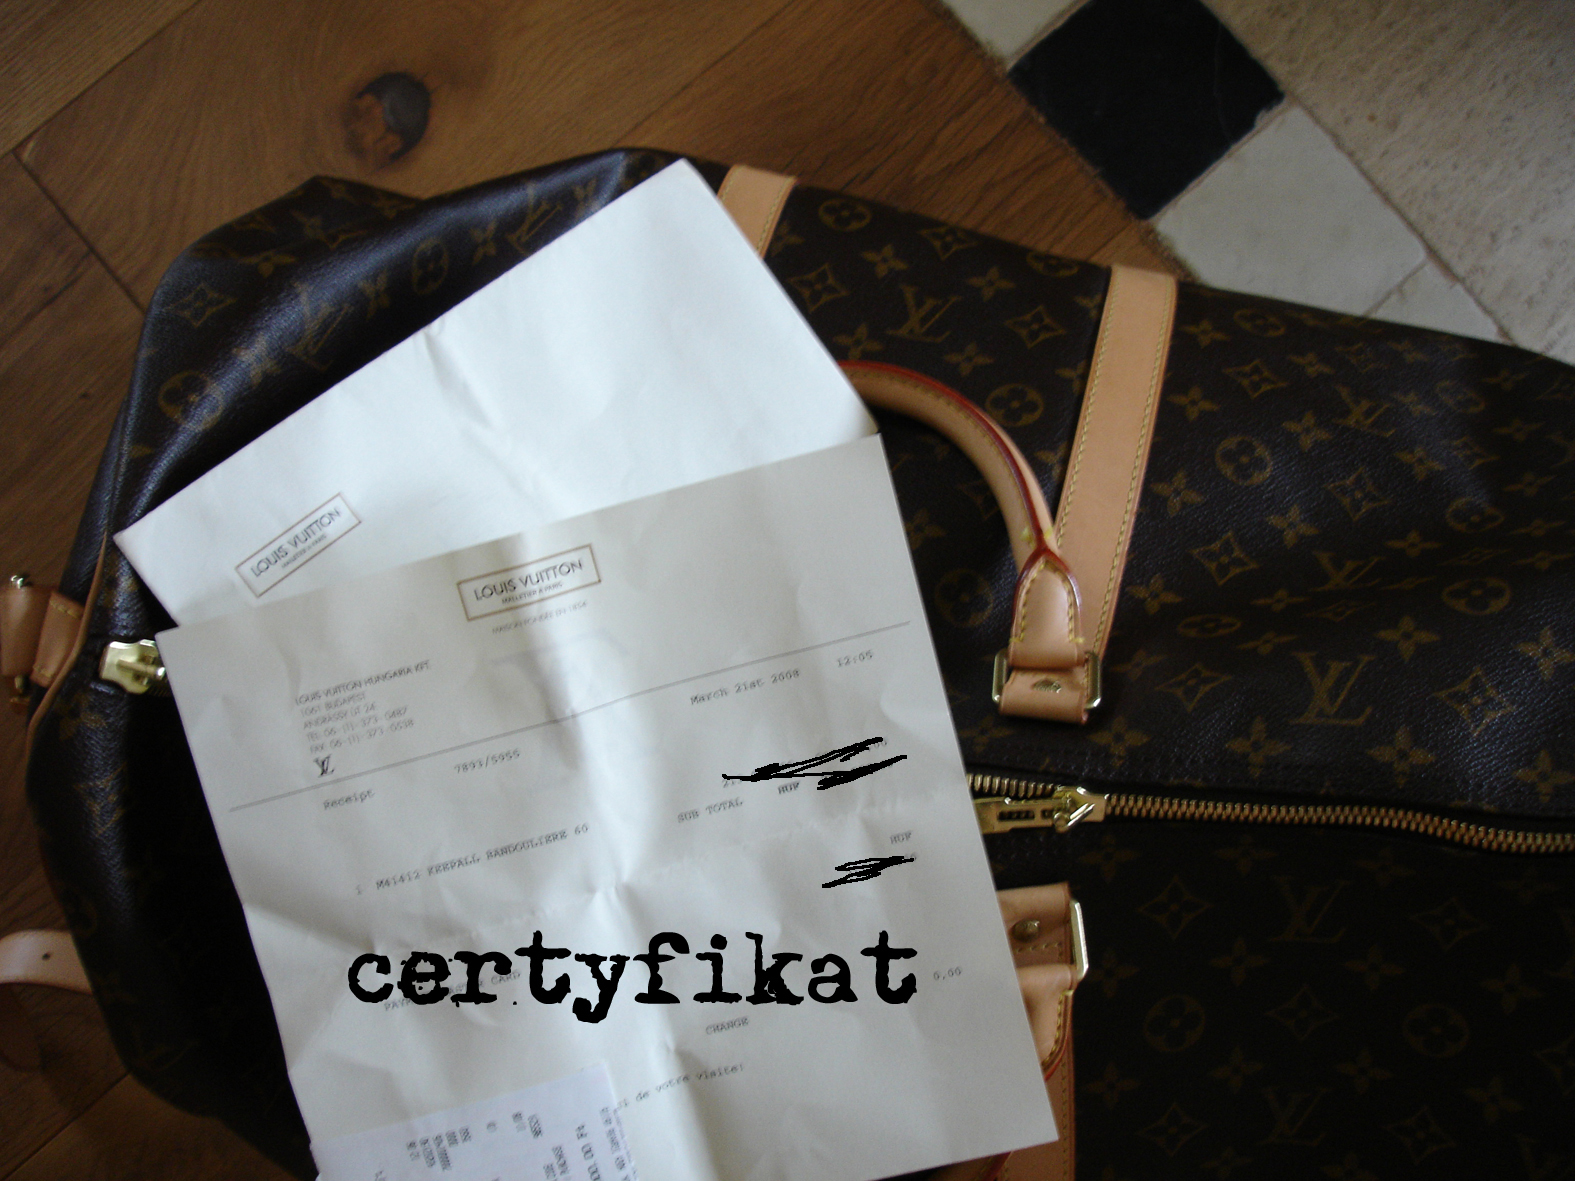 certyf na torbie